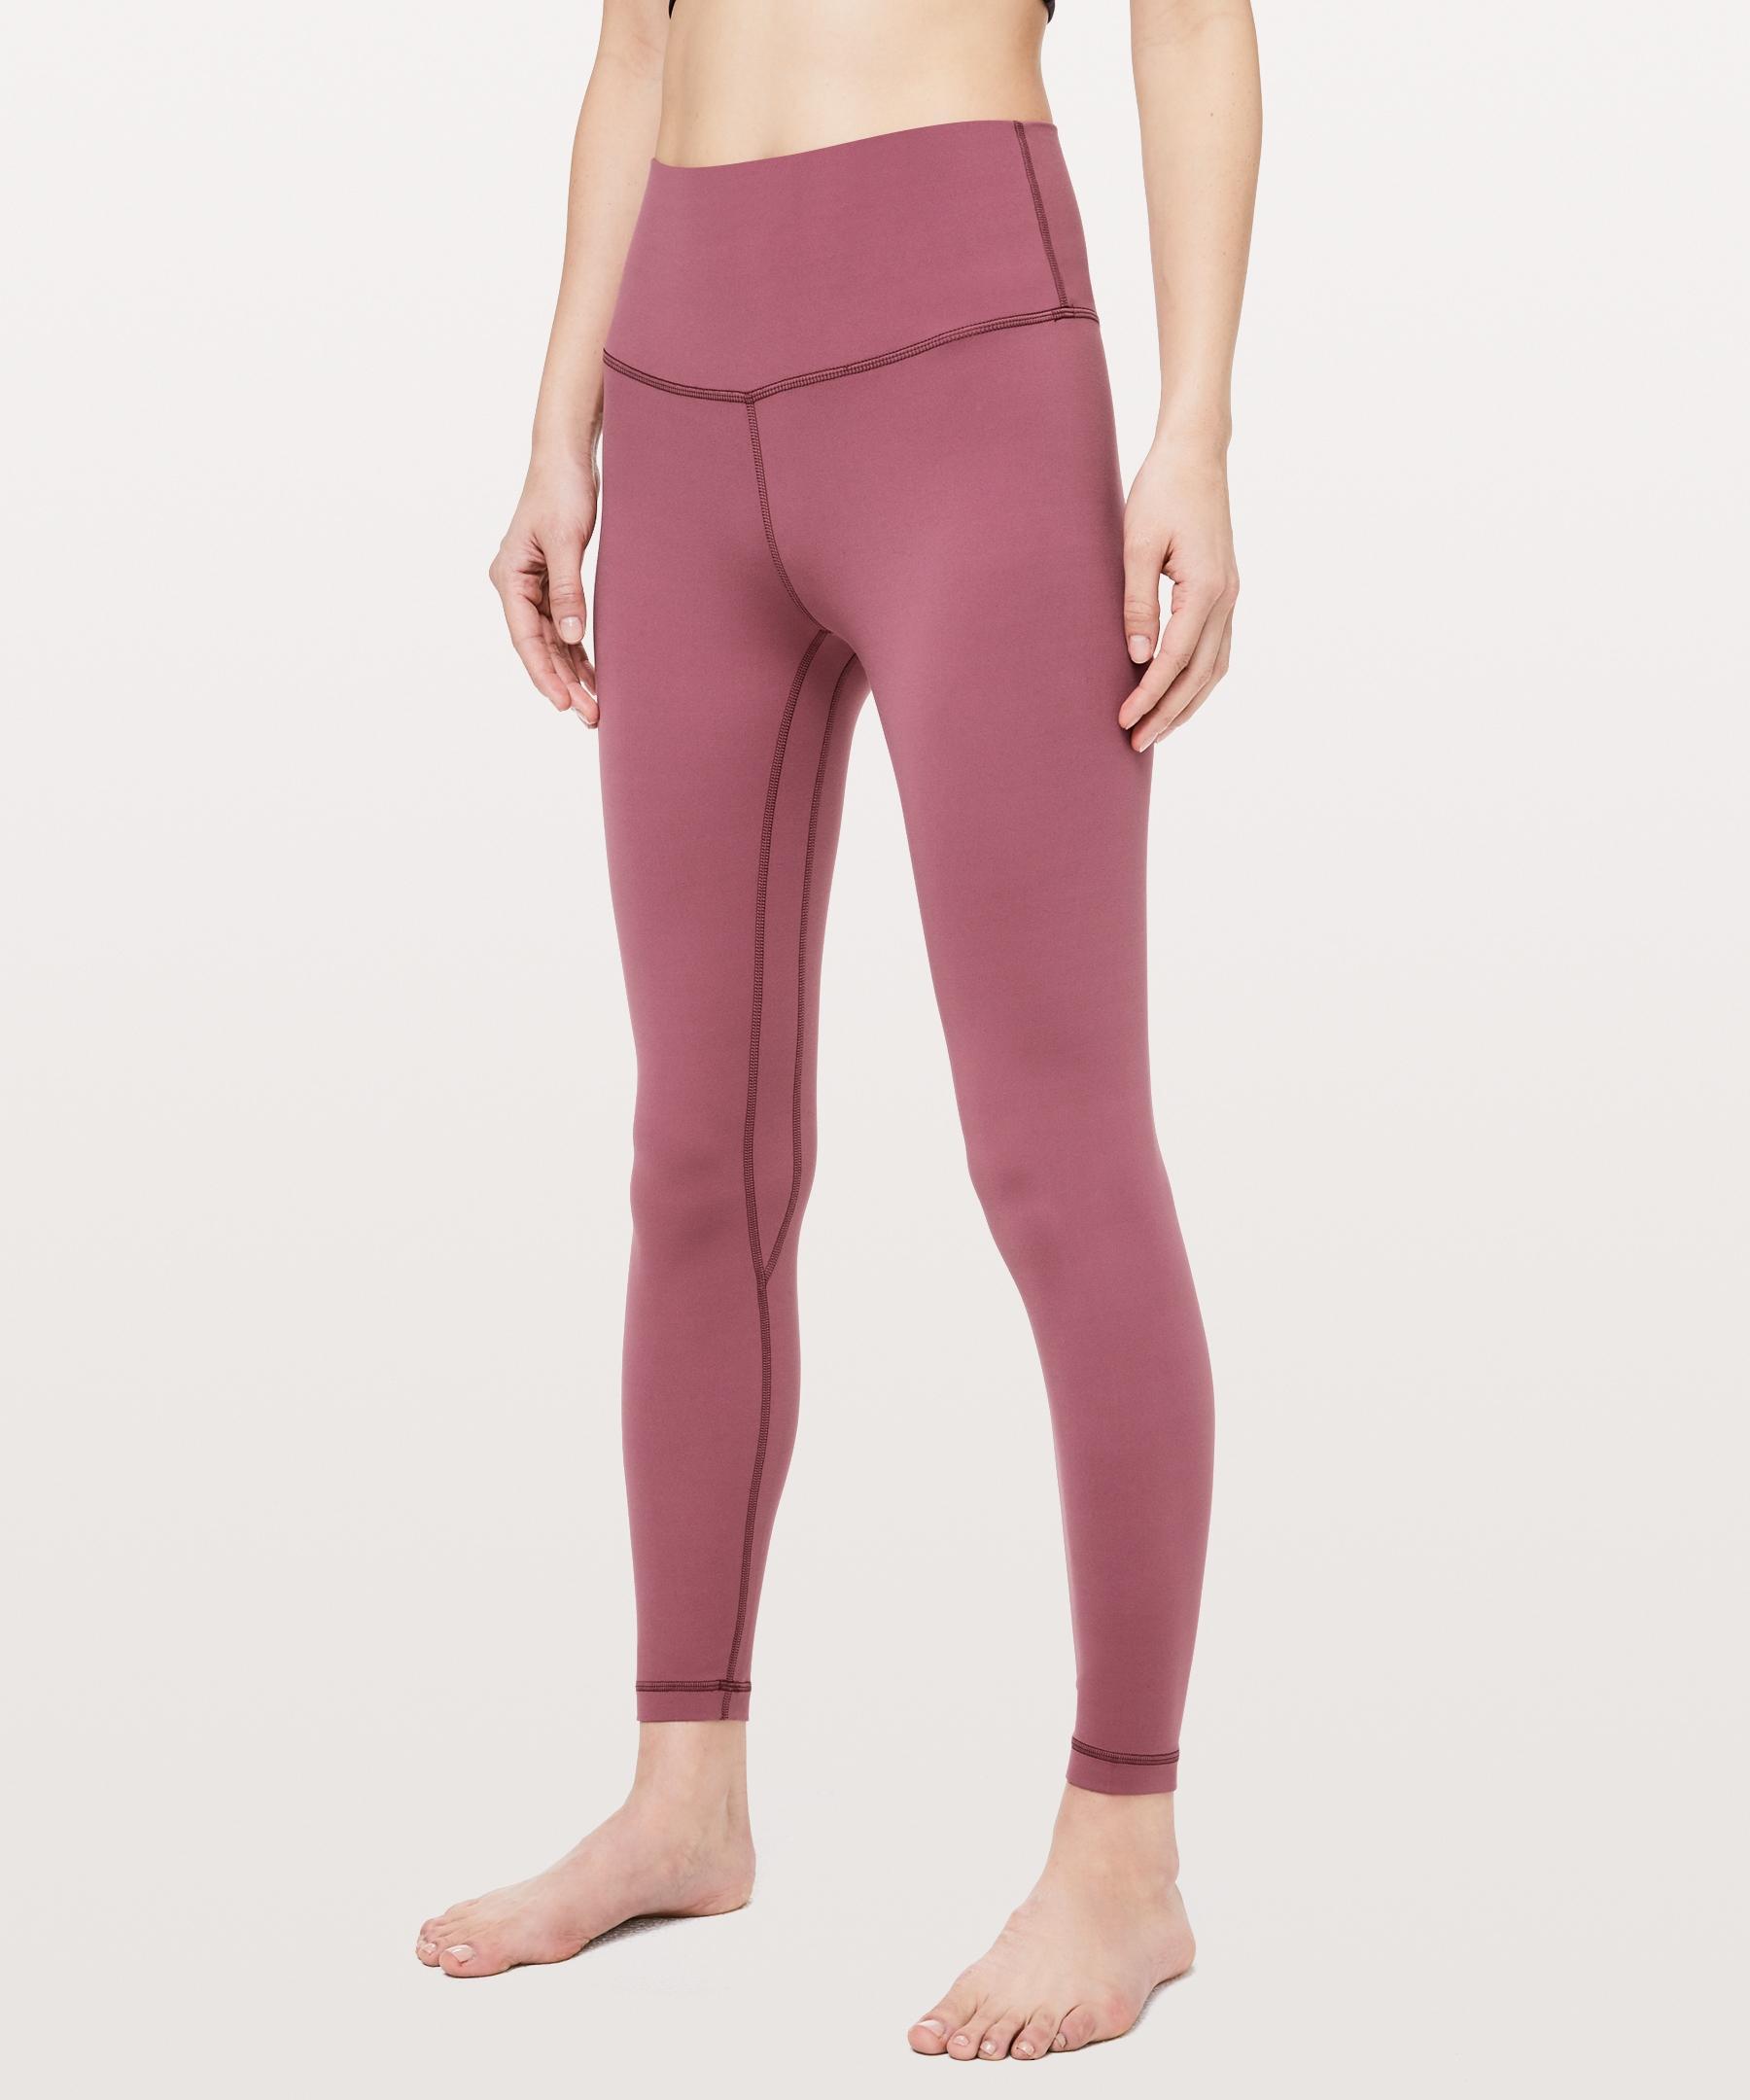 29491718e lululemon athletica - Multicolor Align Pant Ii 25